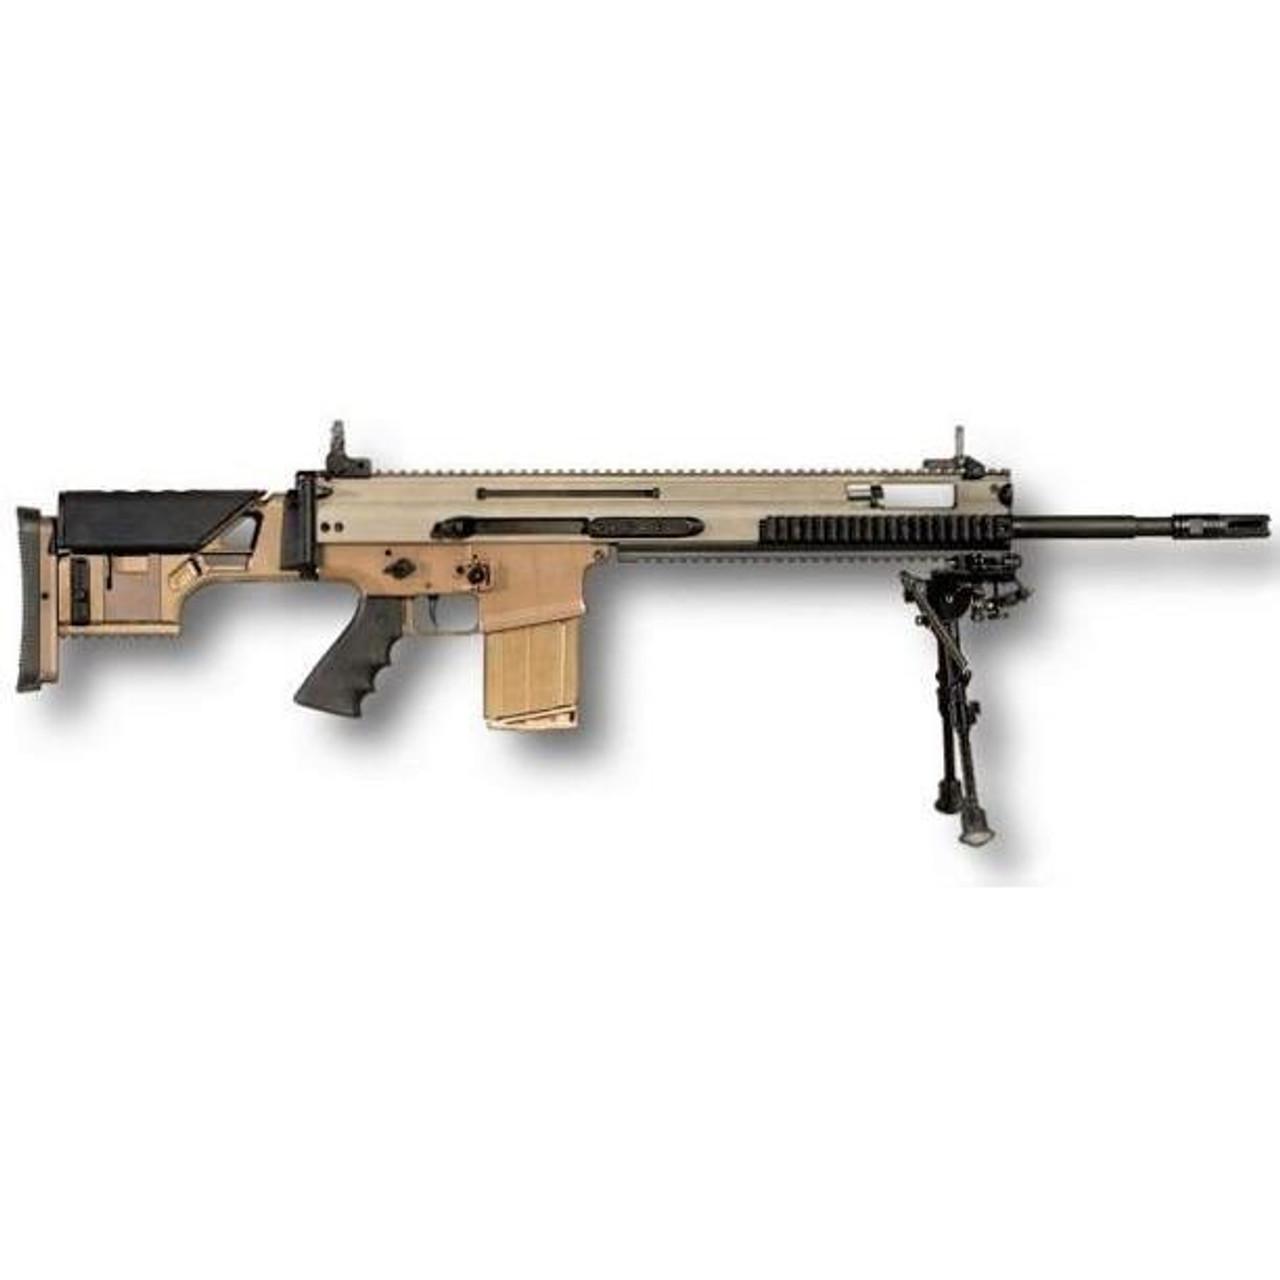 FN Mk20 Scar 20S Collectible Deployment Kit